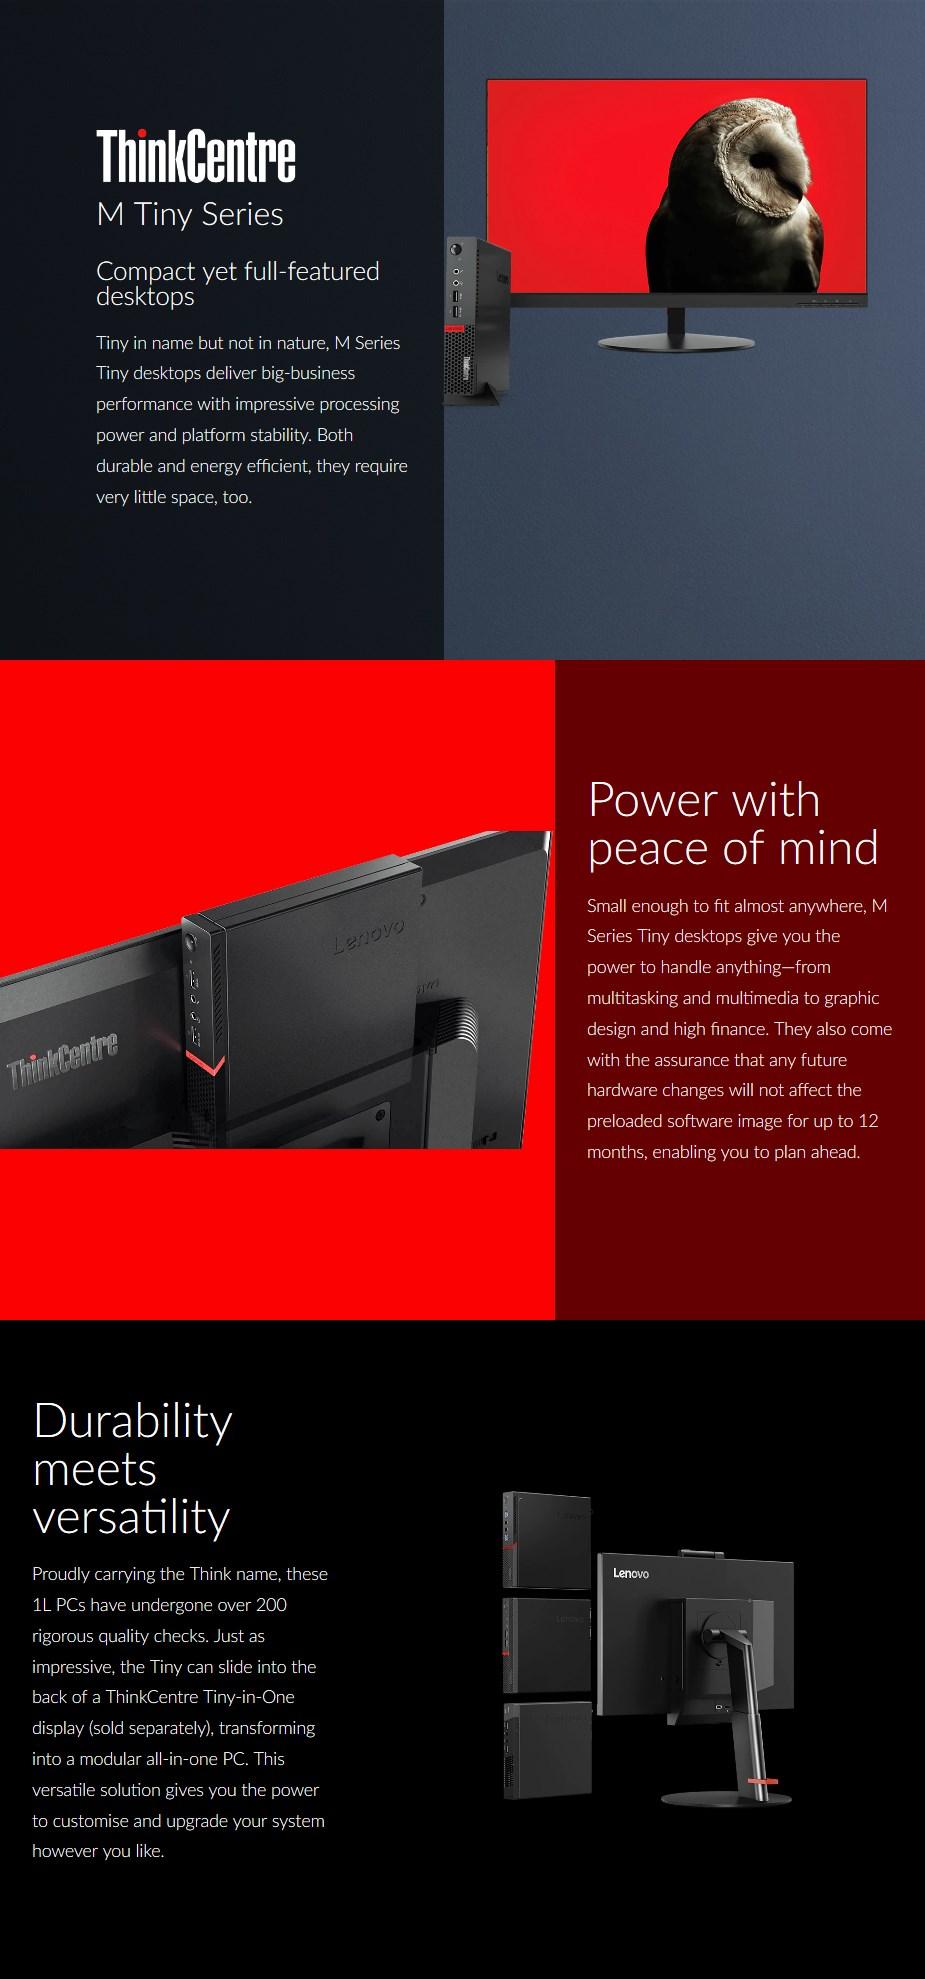 Lenovo ThinkCentre M720Q Tiny PC i7-9700T 16GB 512GB Win10 Pro - Desktop Overview 1